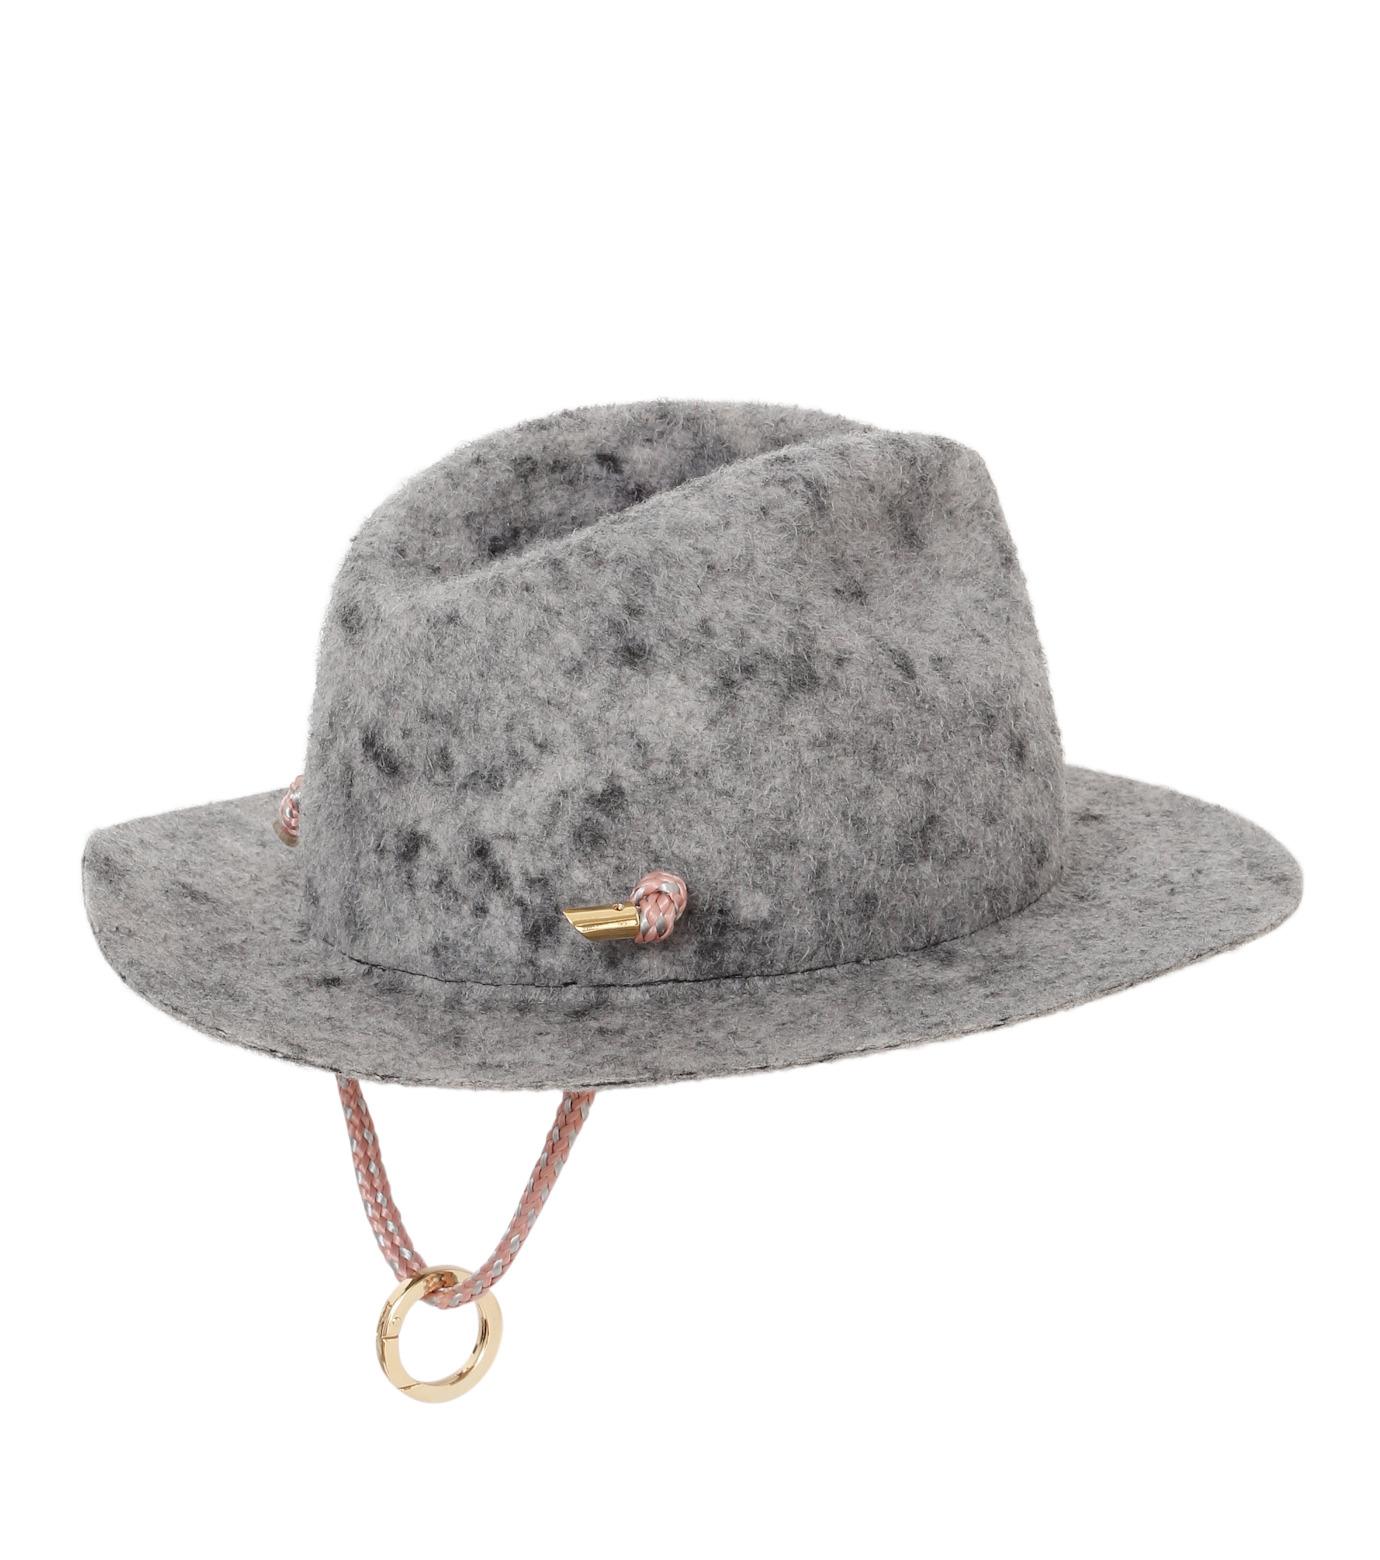 Federica Moretti(フェデリカ モレッティ)のBoiled felt Hat w/Rope-GRAY(キャップ/cap)-CAMO-11 拡大詳細画像2